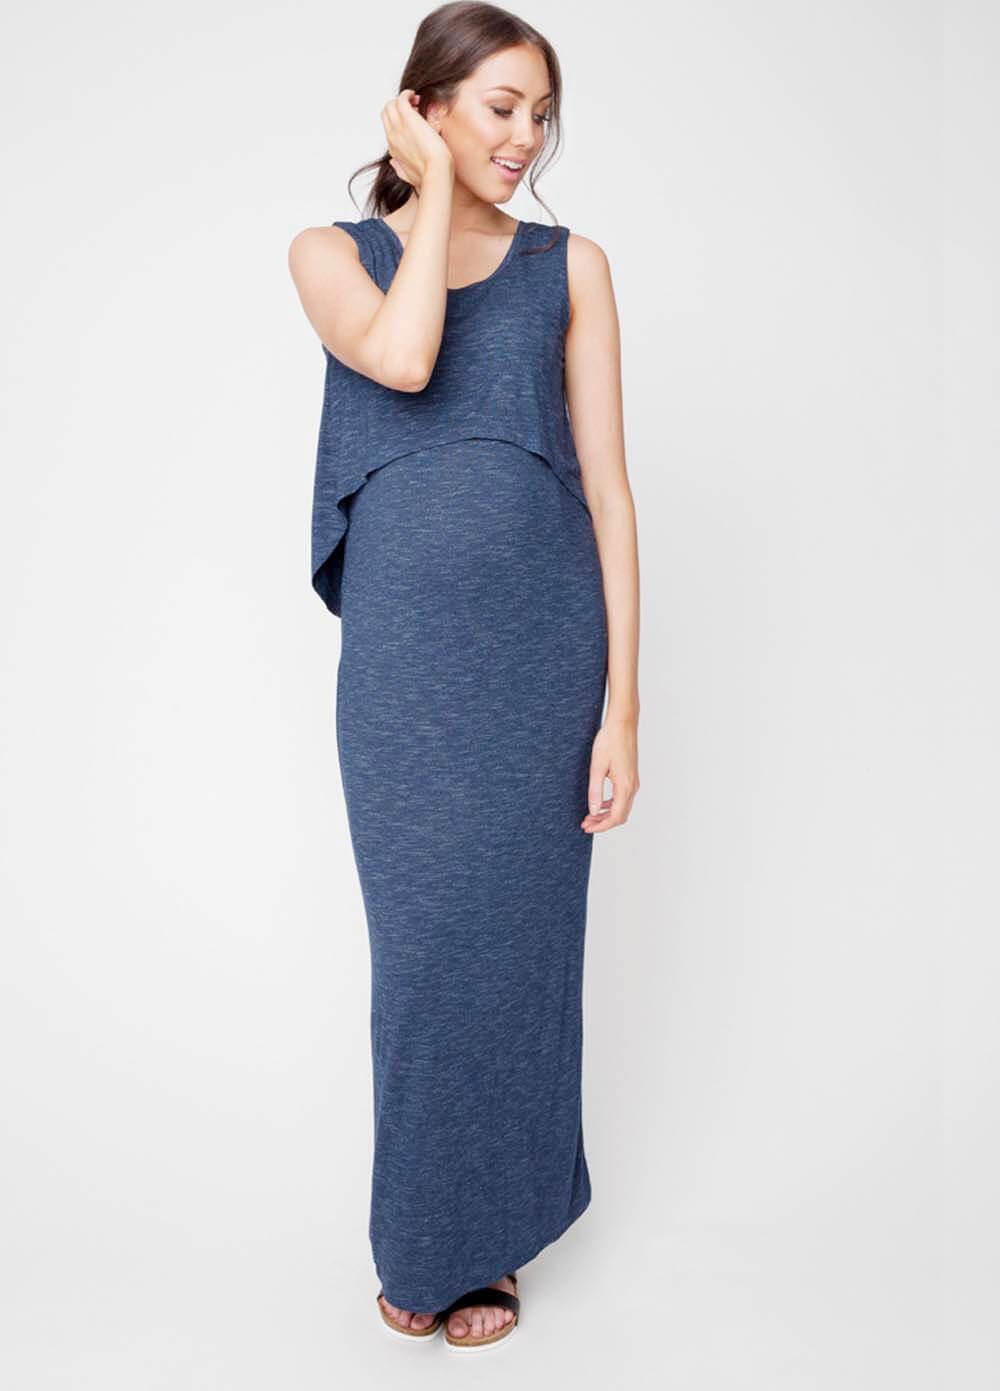 Swing Back Layered Maternity Nursing Maxi Dress in Blue by Ripe